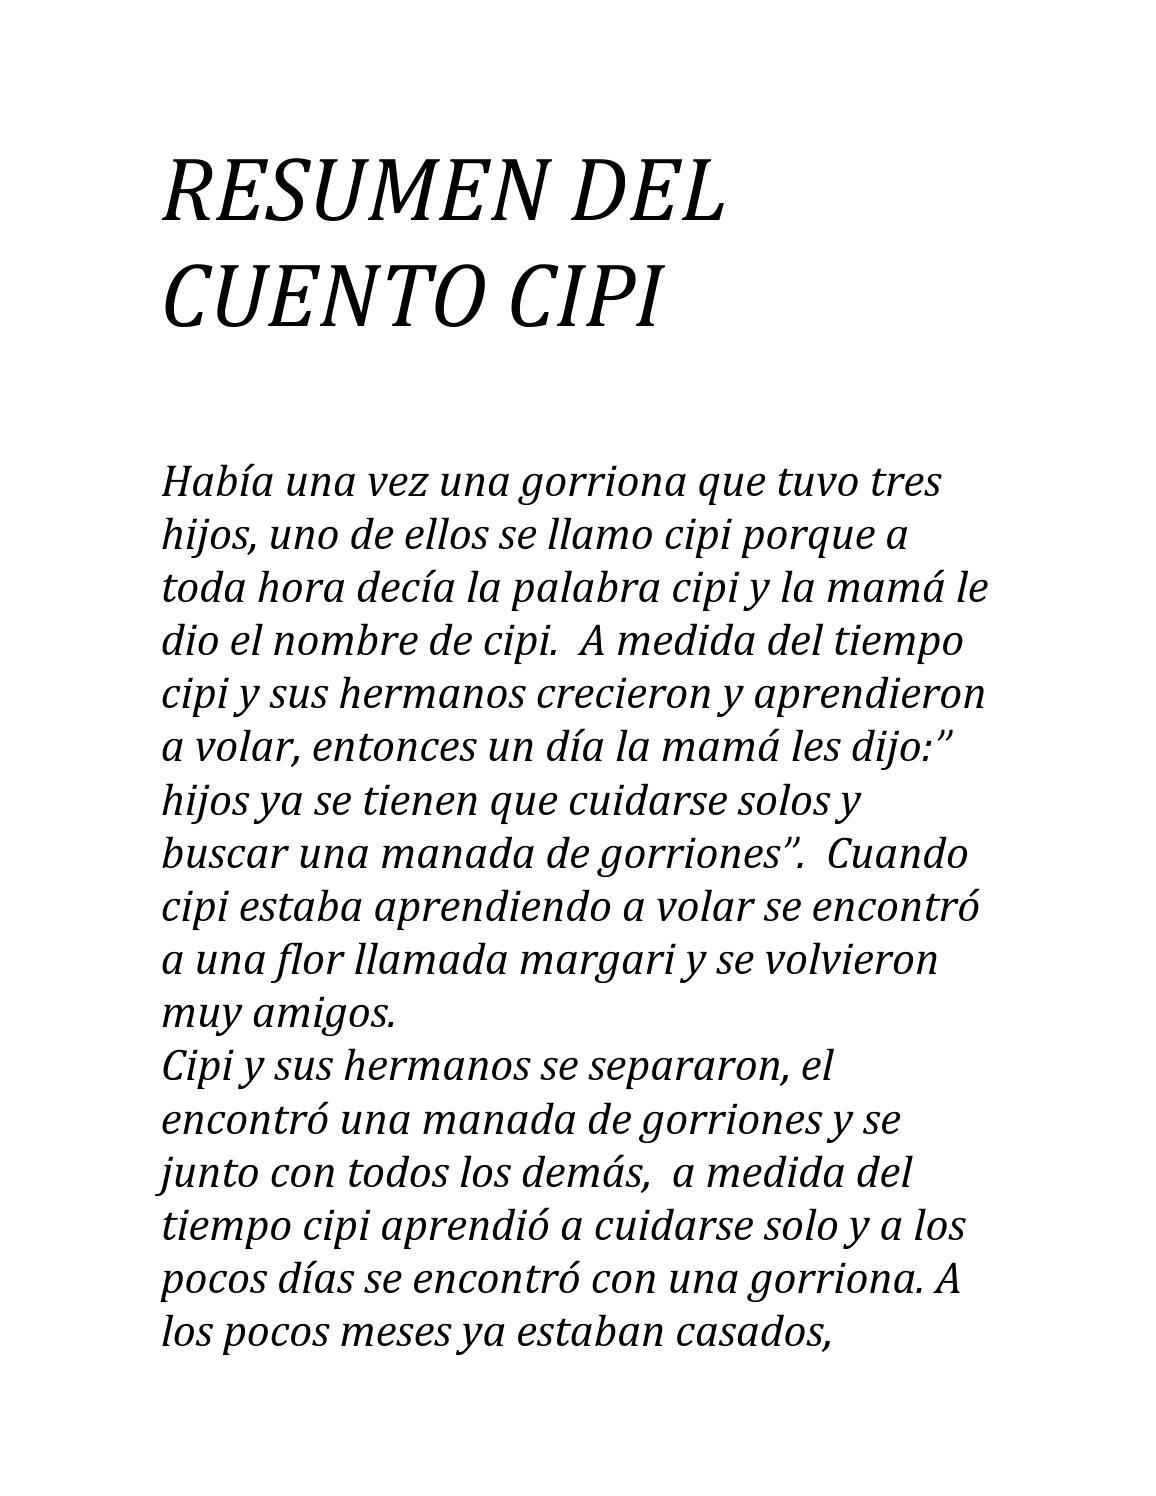 Resumen del cuento cipi by leonardo castro - Issuu